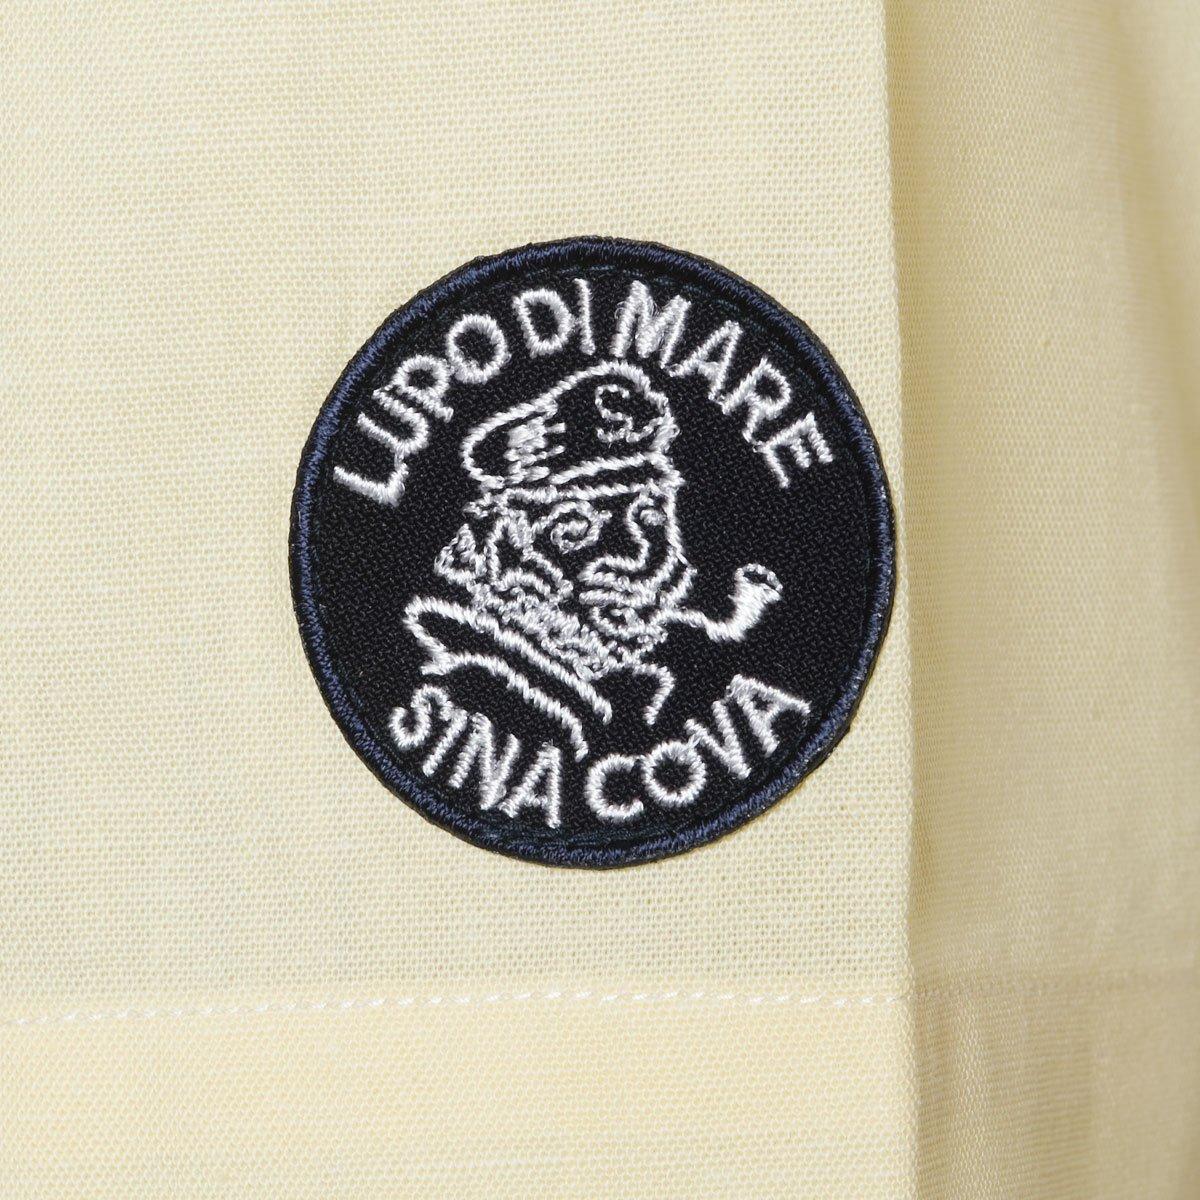 Cova SINACOVA 18124510 Men's Short Sleeve Shirt Yellow Medium by Cova (Image #6)